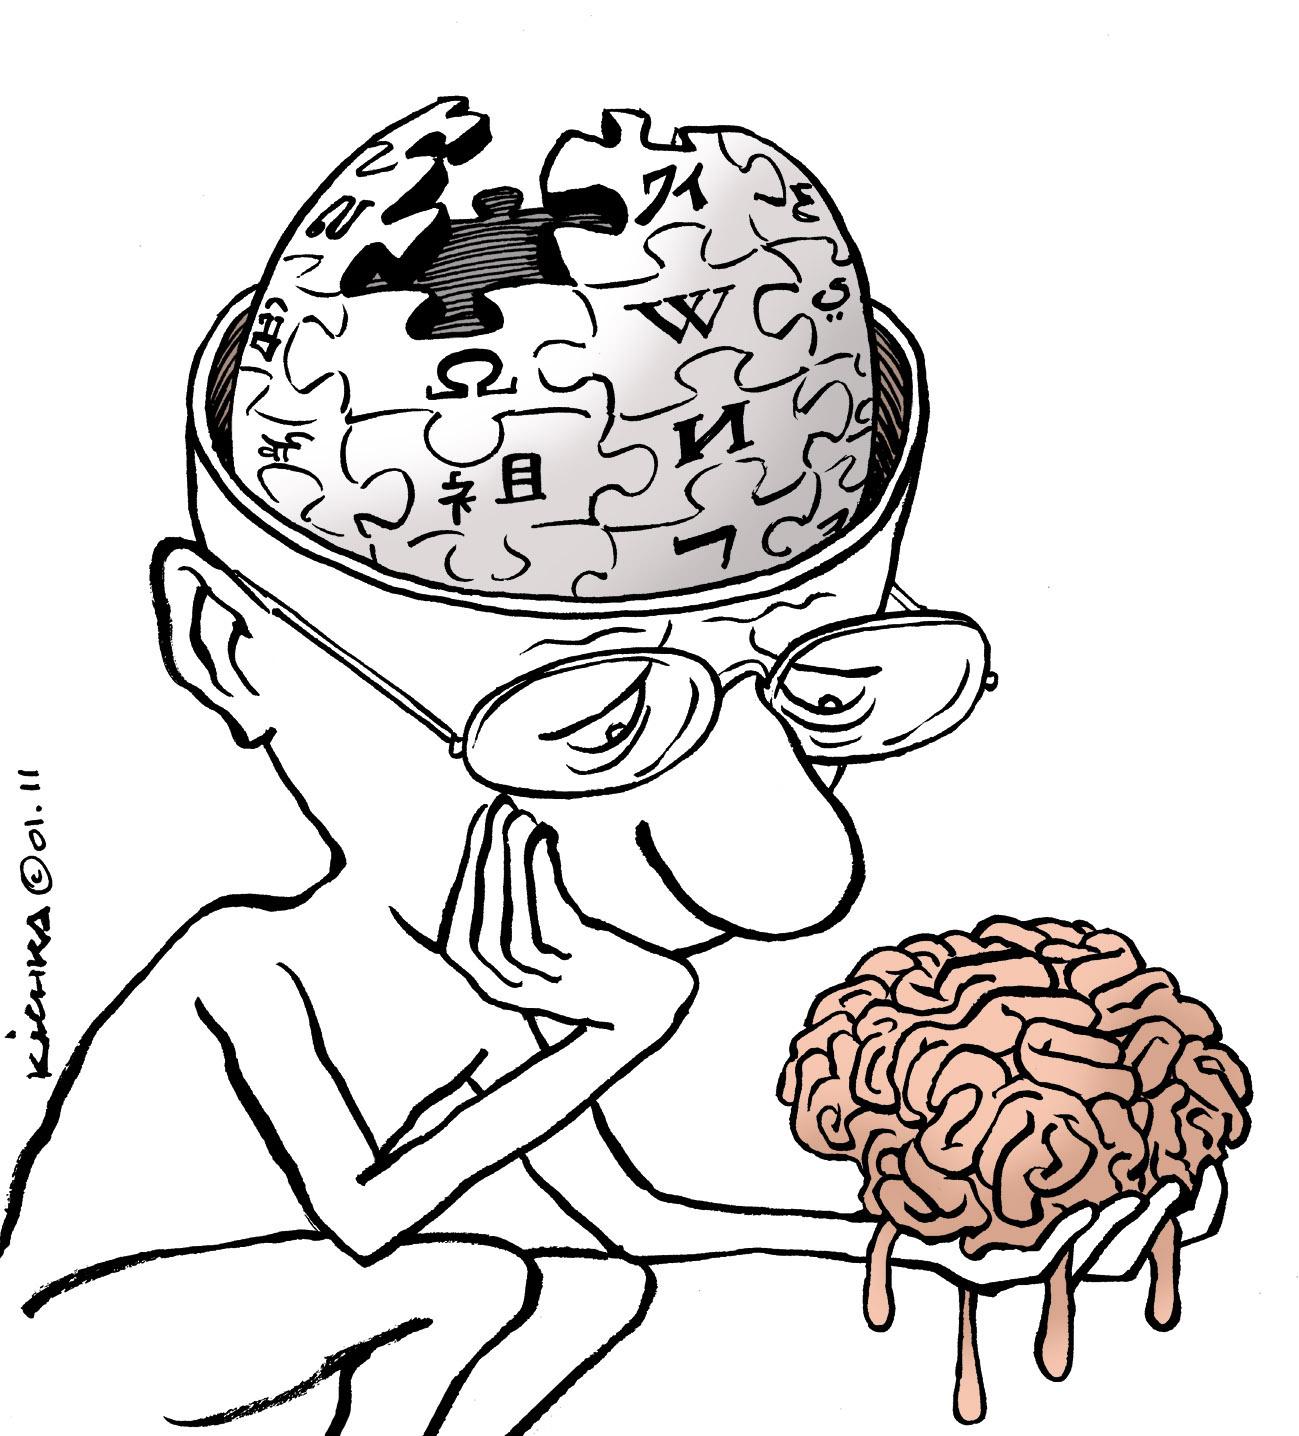 Cartoon of a man holding a brain.